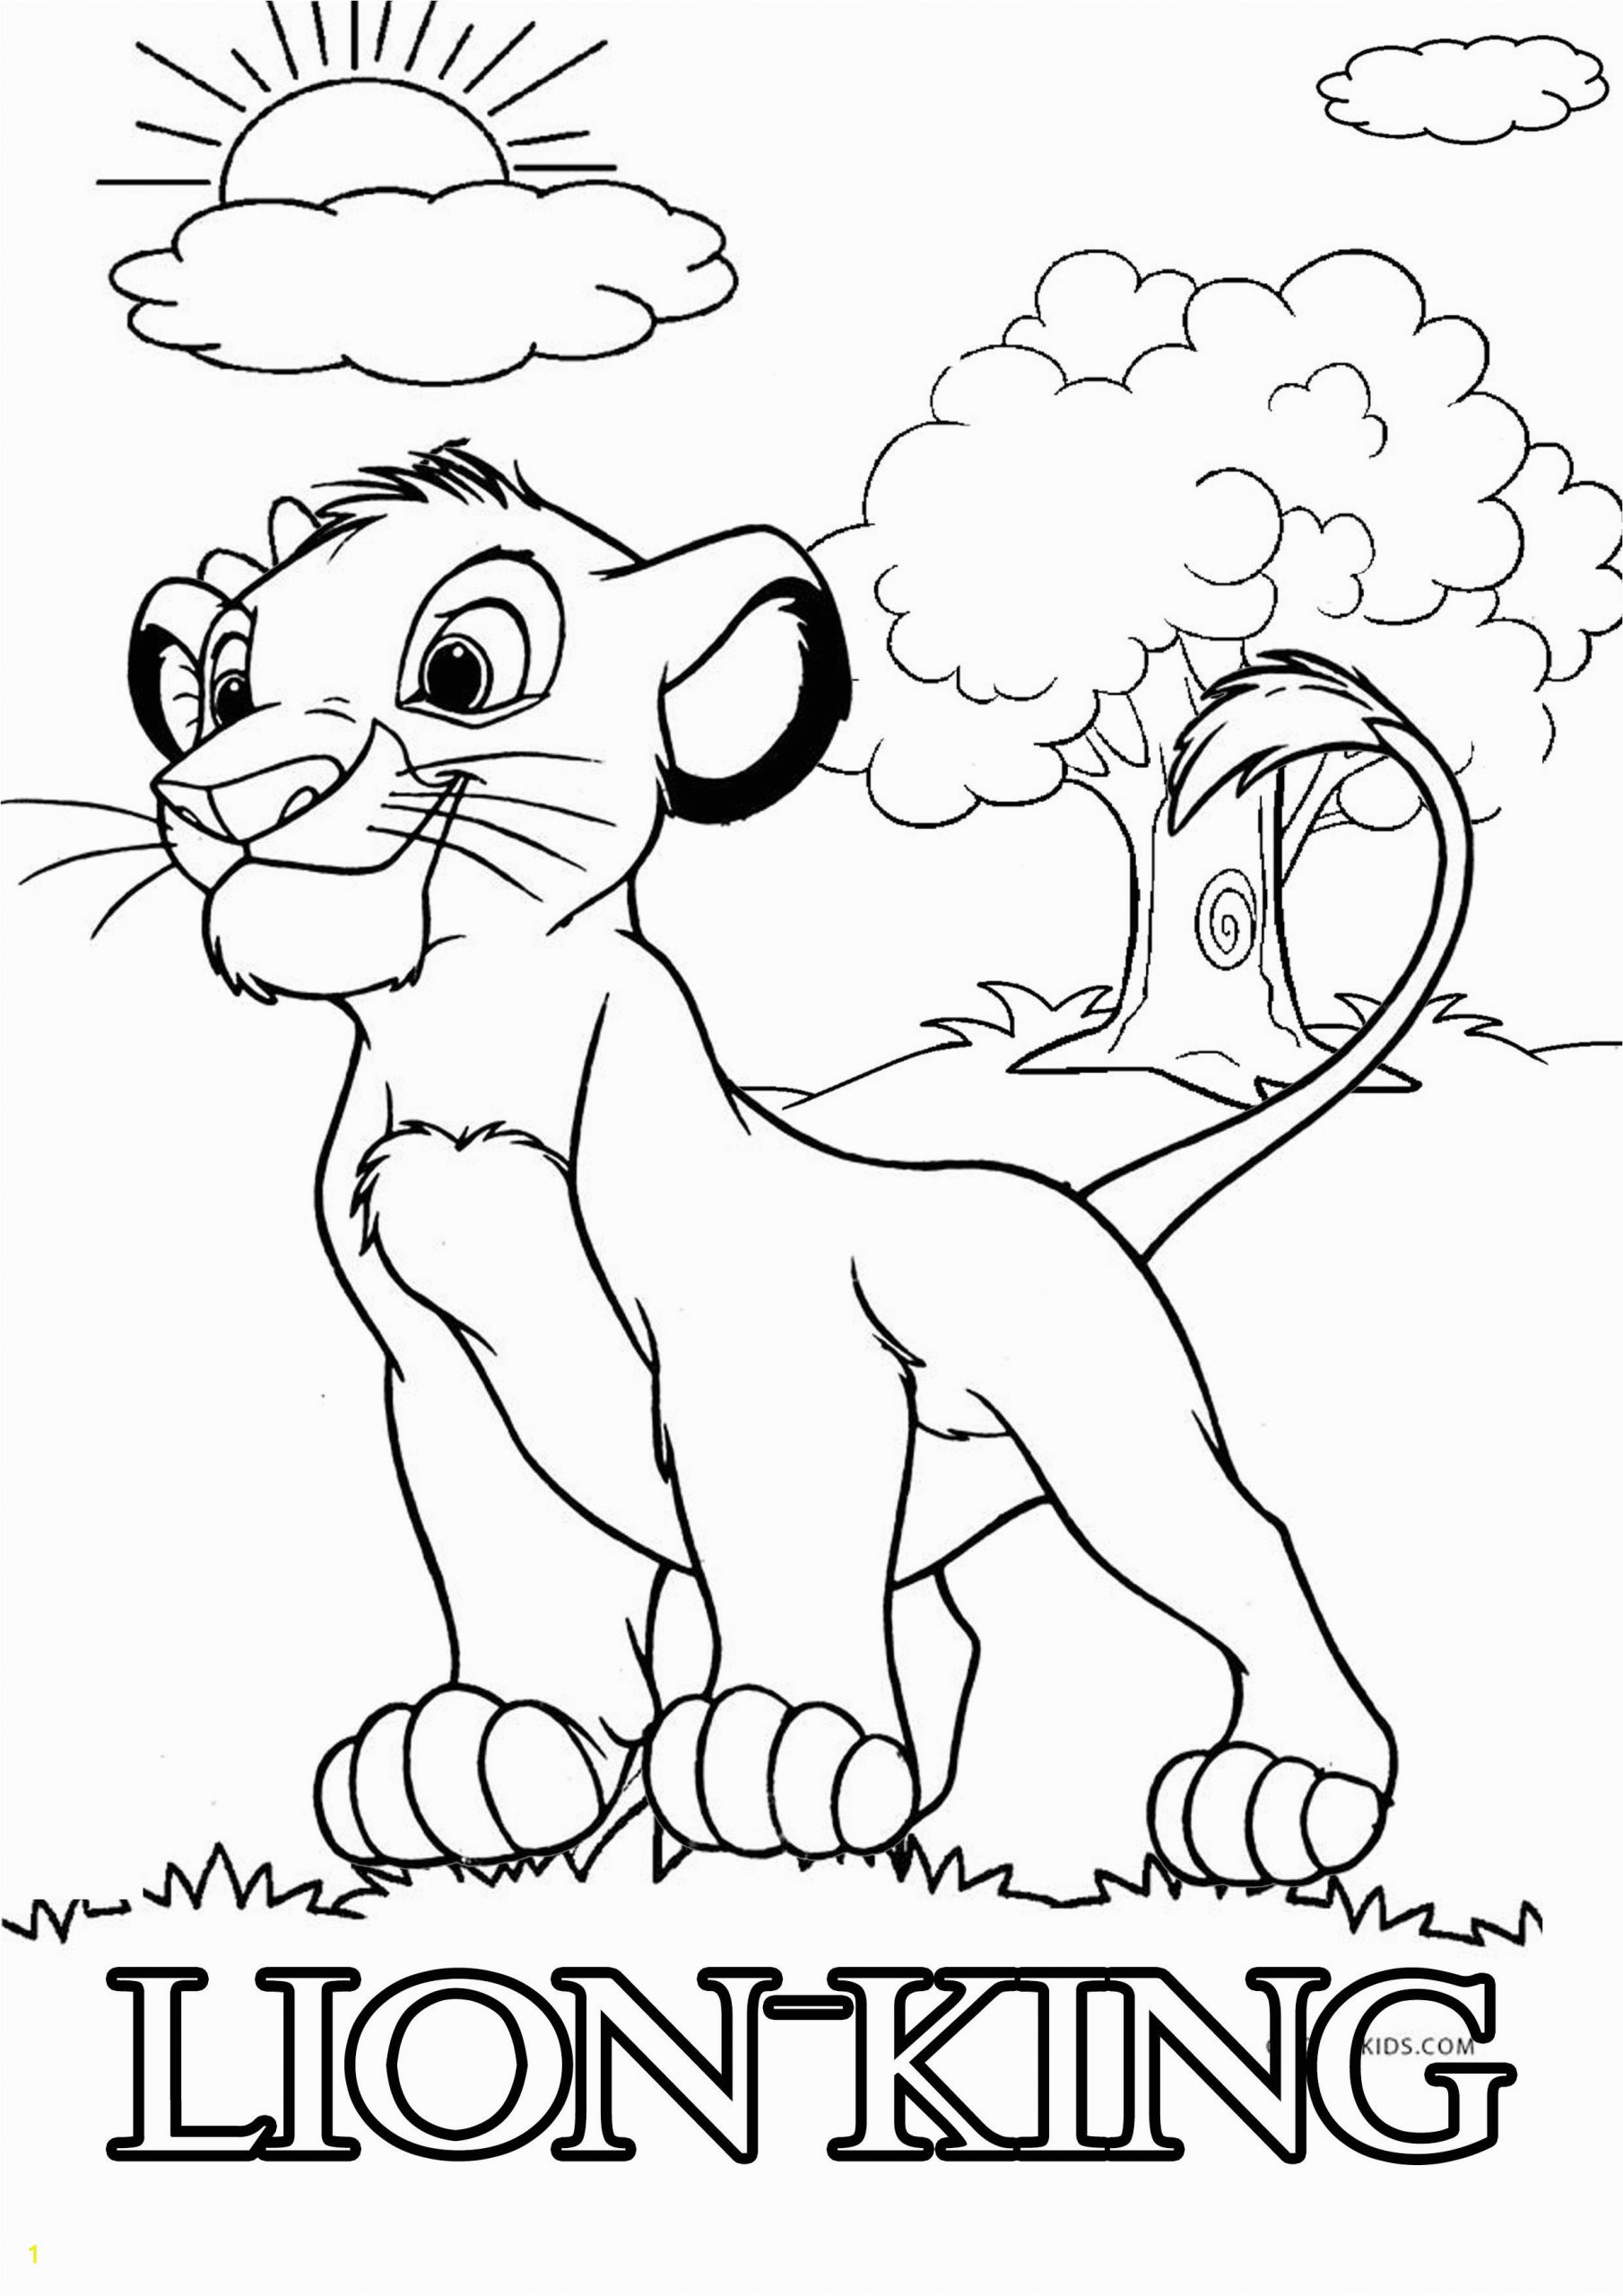 Lion King Free Printable Coloring Pages Simba Lion King Coloring Pages Free In 2020